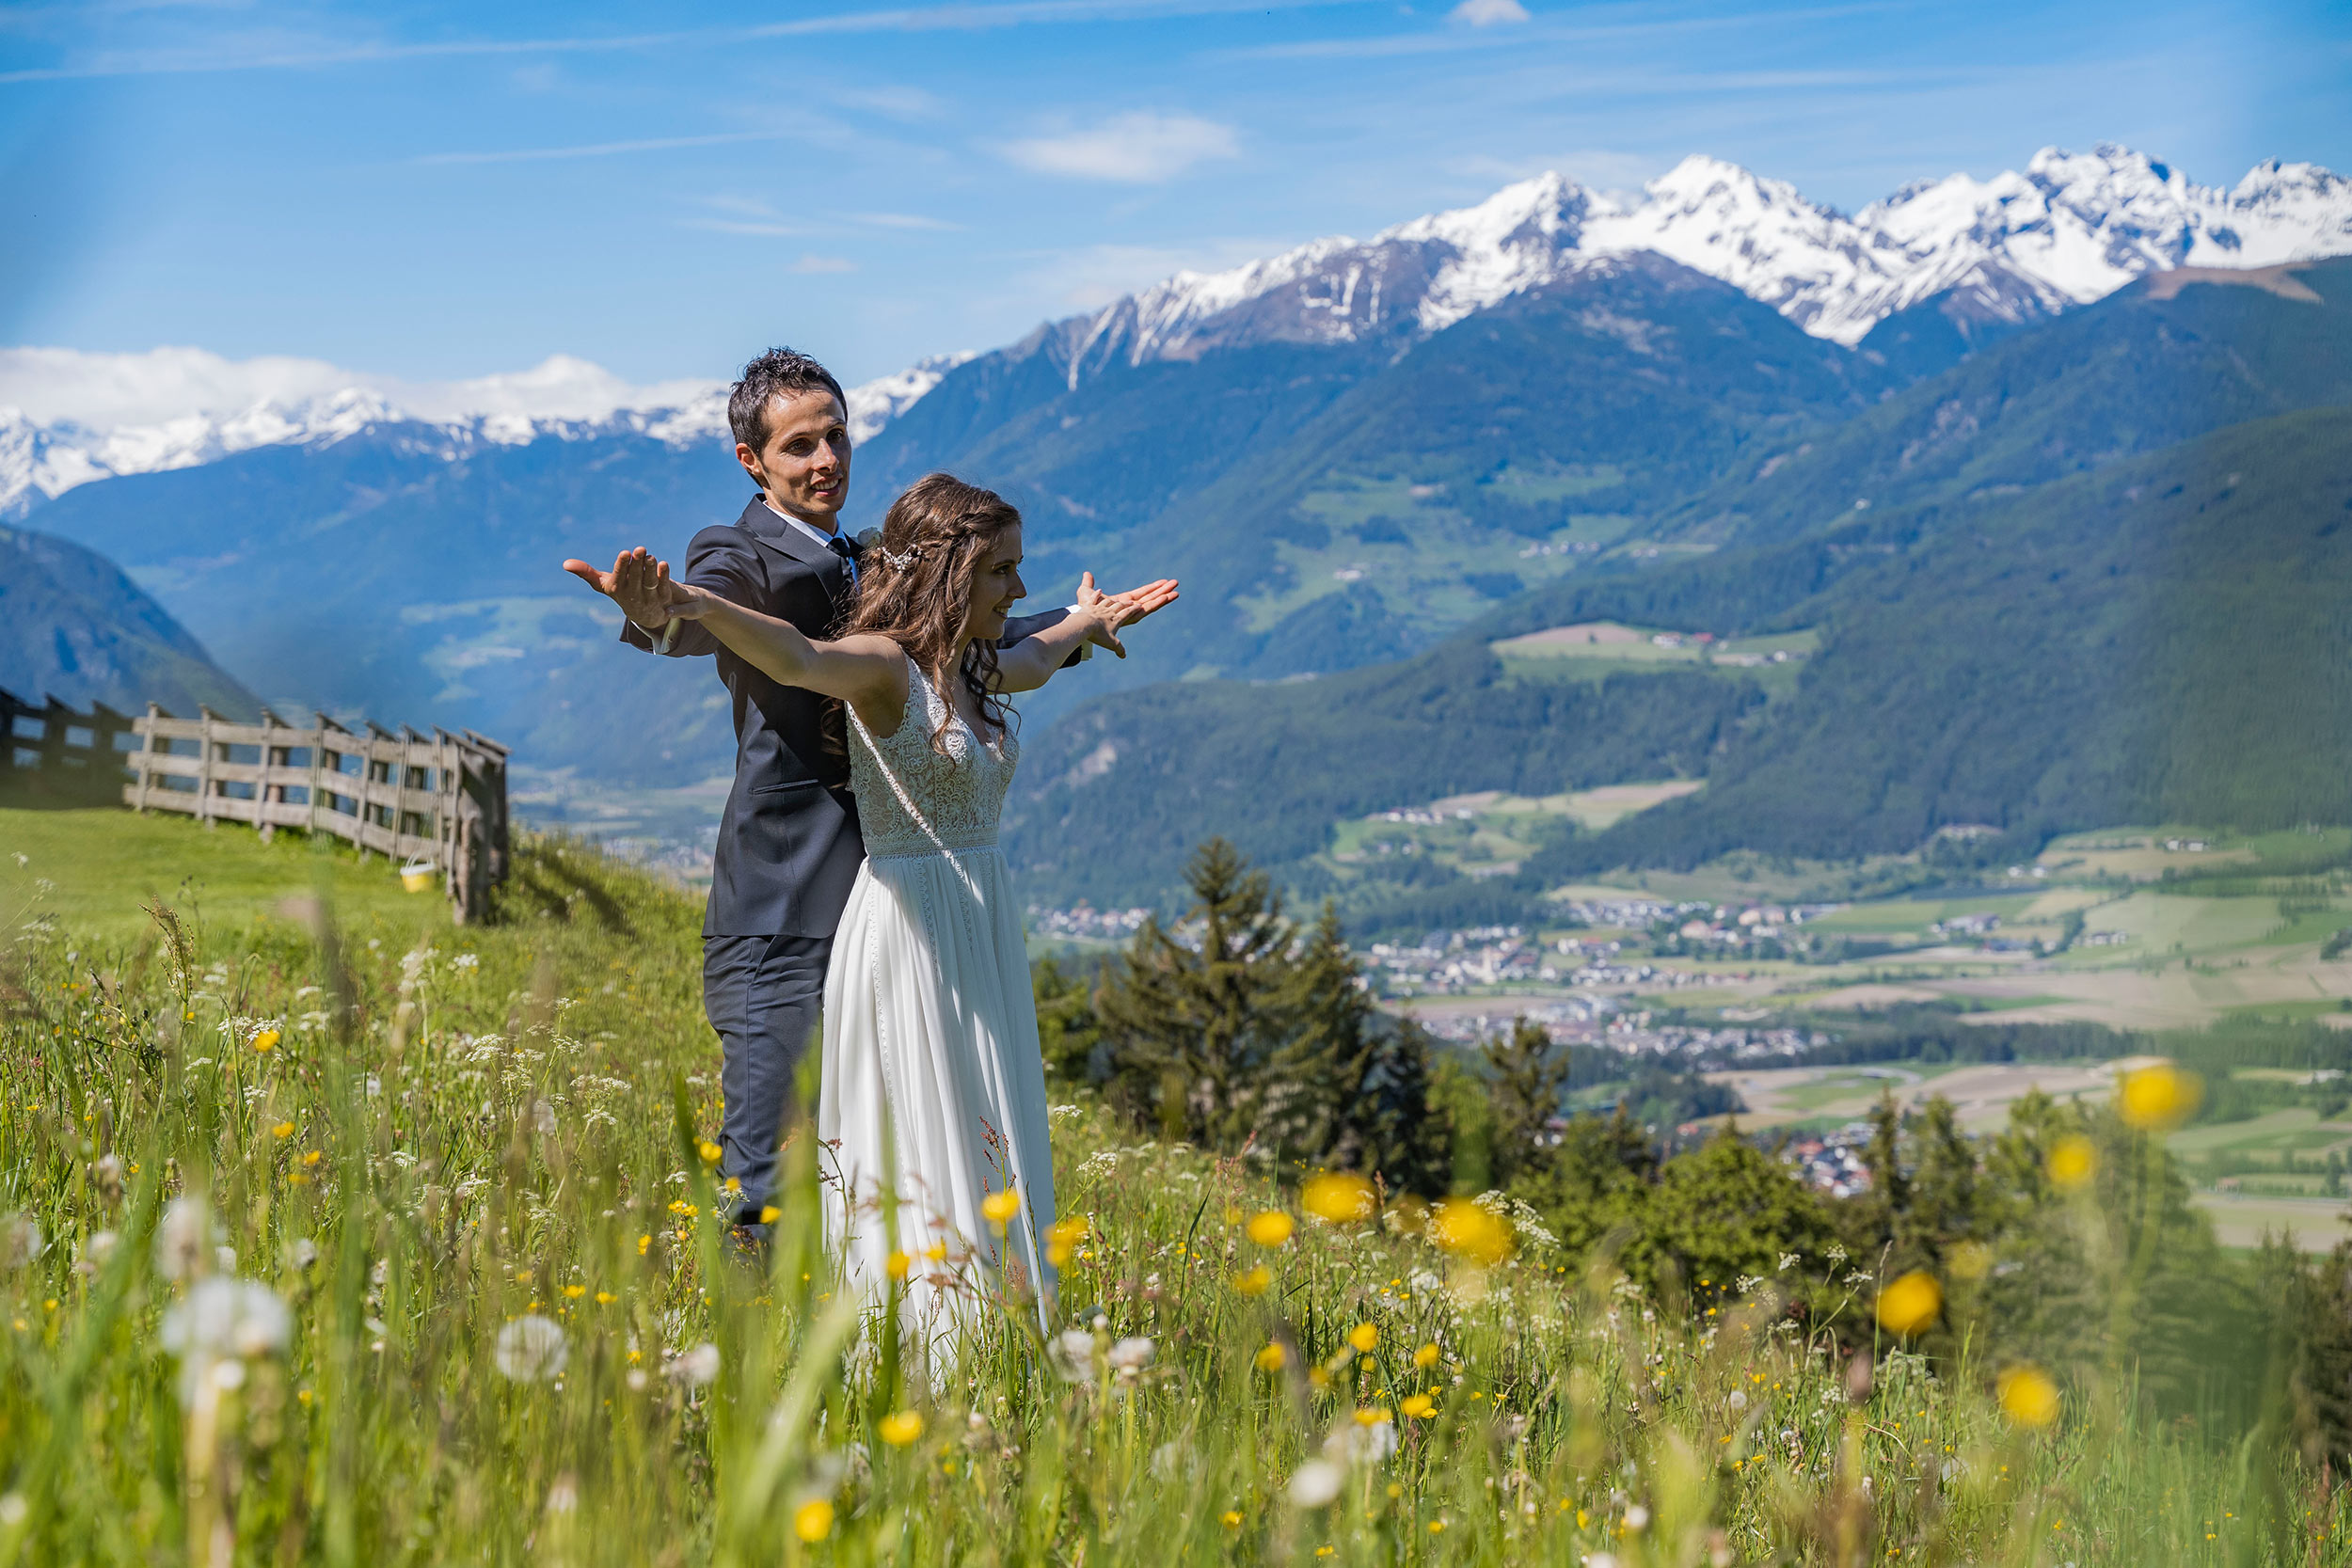 Evi_&_Christian_Hochzeit_01-06-2019_405